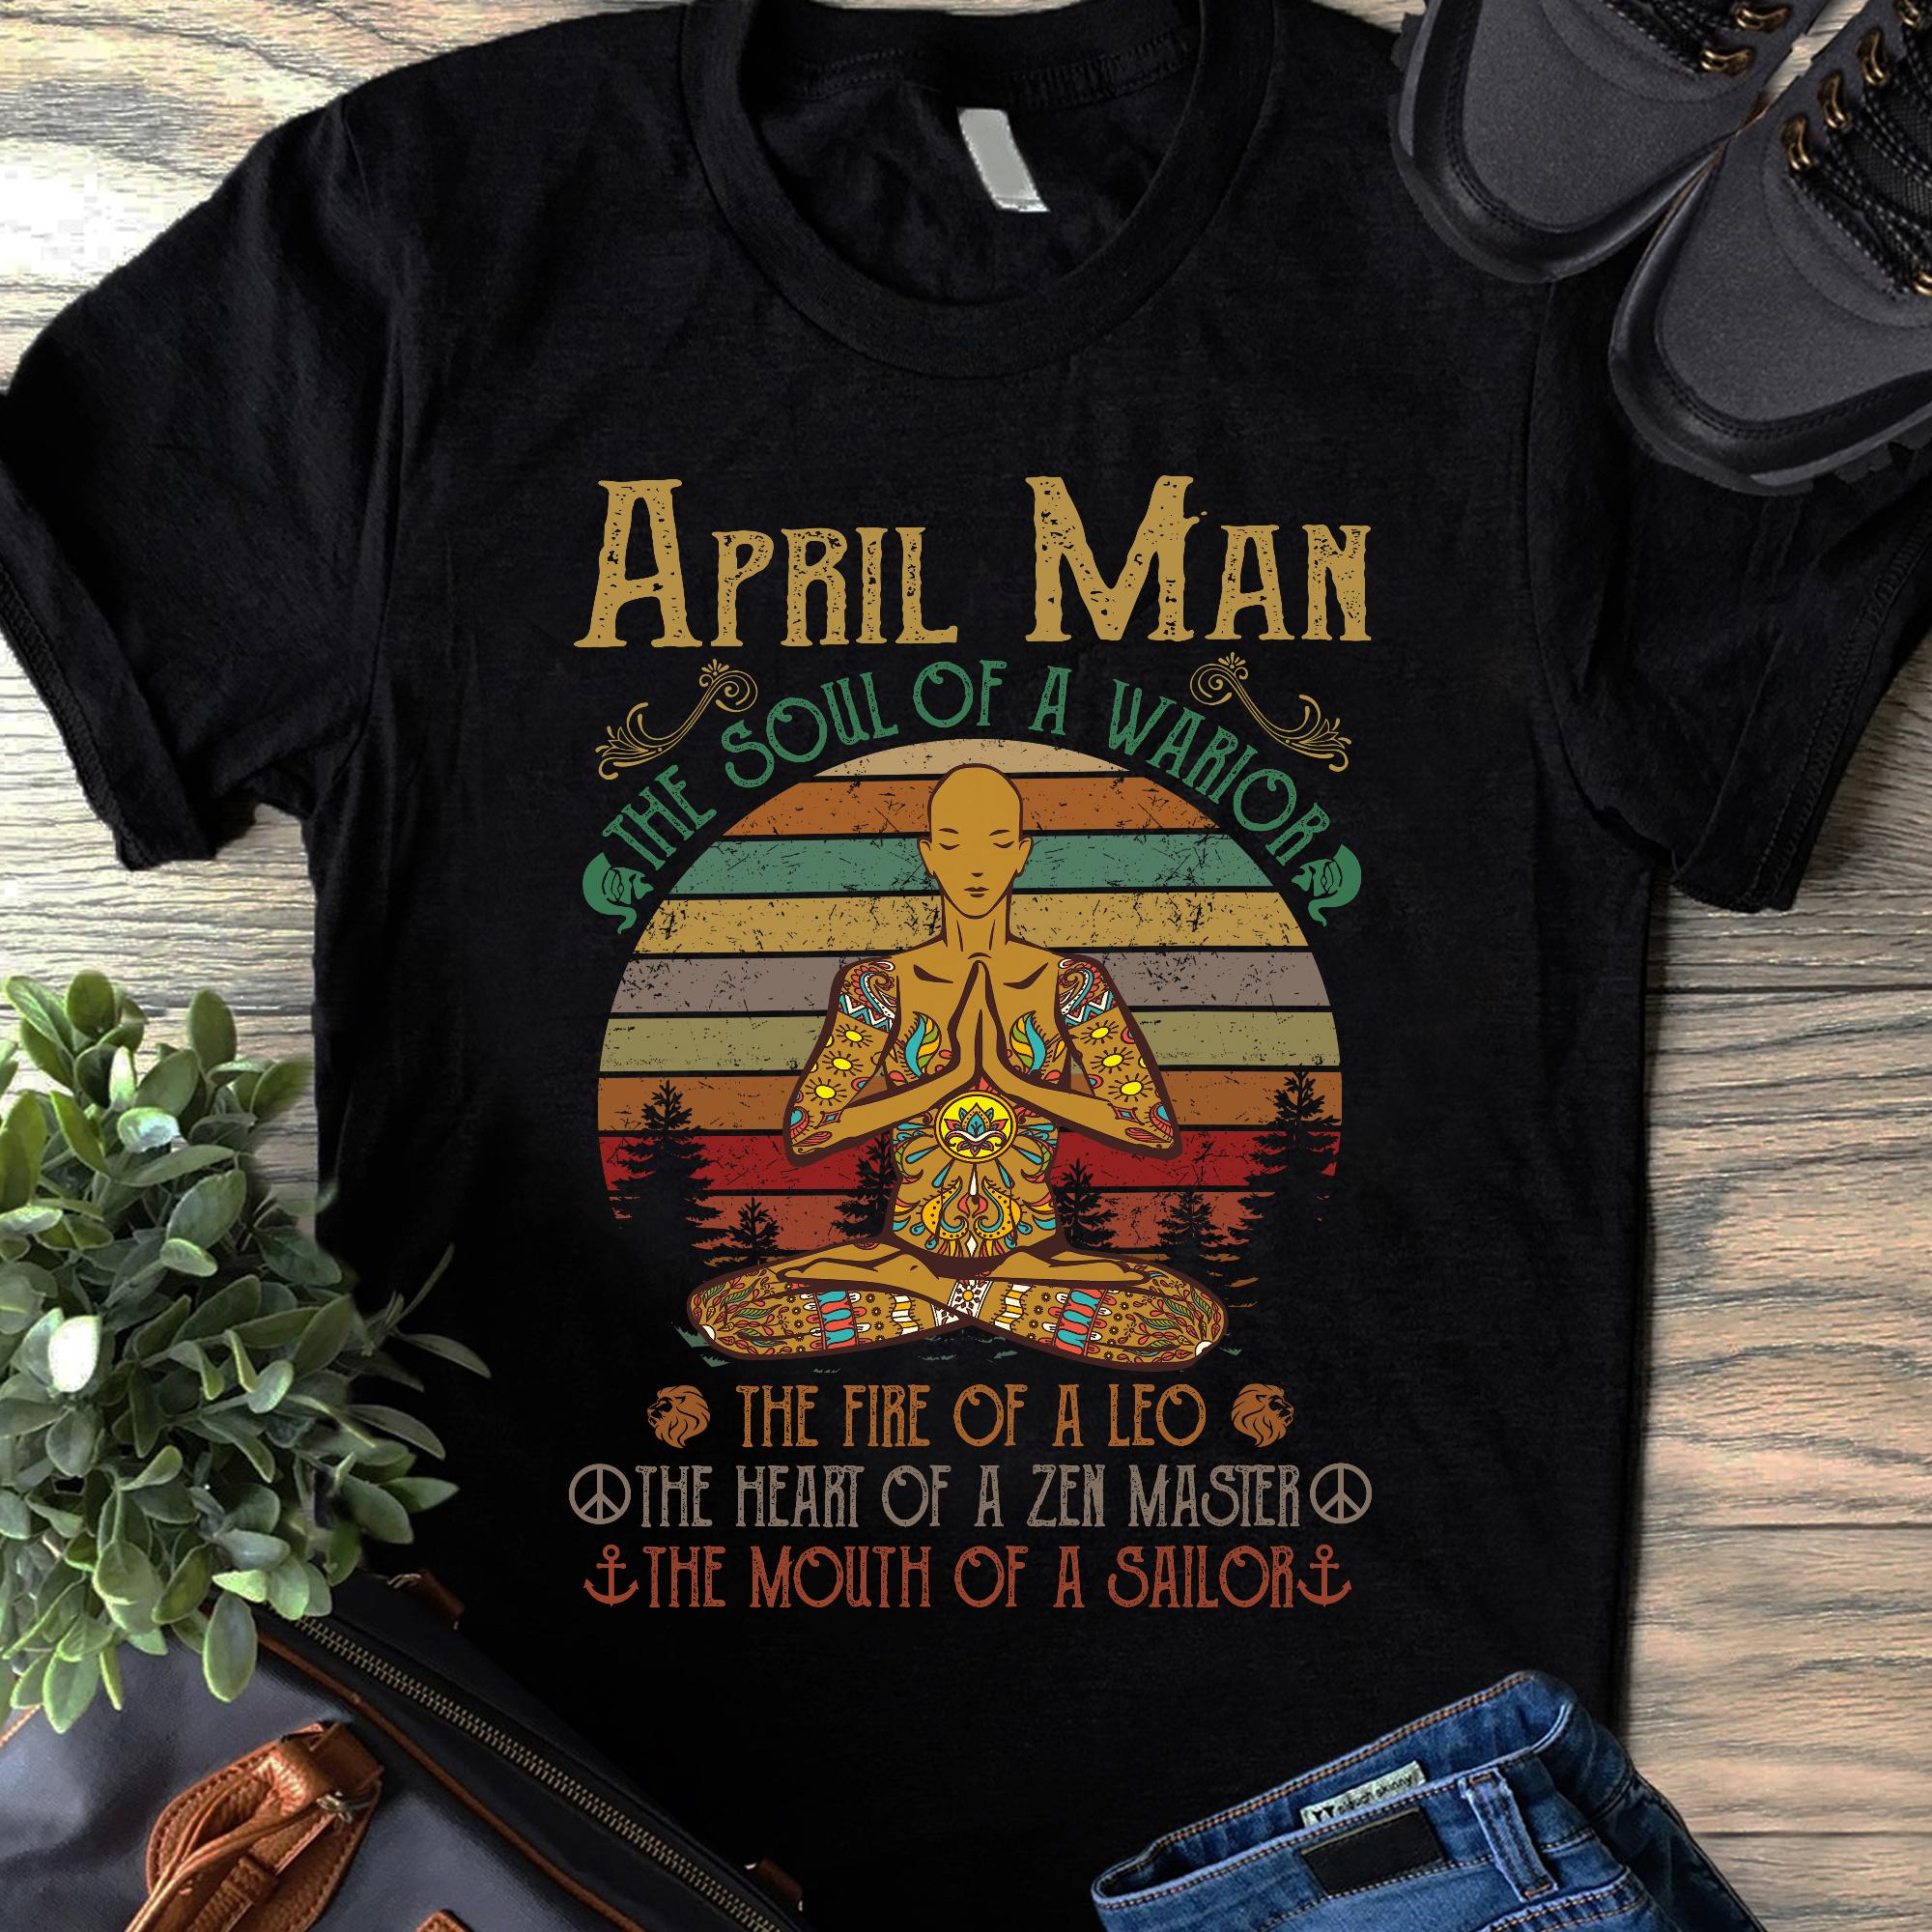 Hippie Yoga Shirt April Man The Soul Of A WarriorHippie Yoga Shirt April Man The Soul Of A Warrior